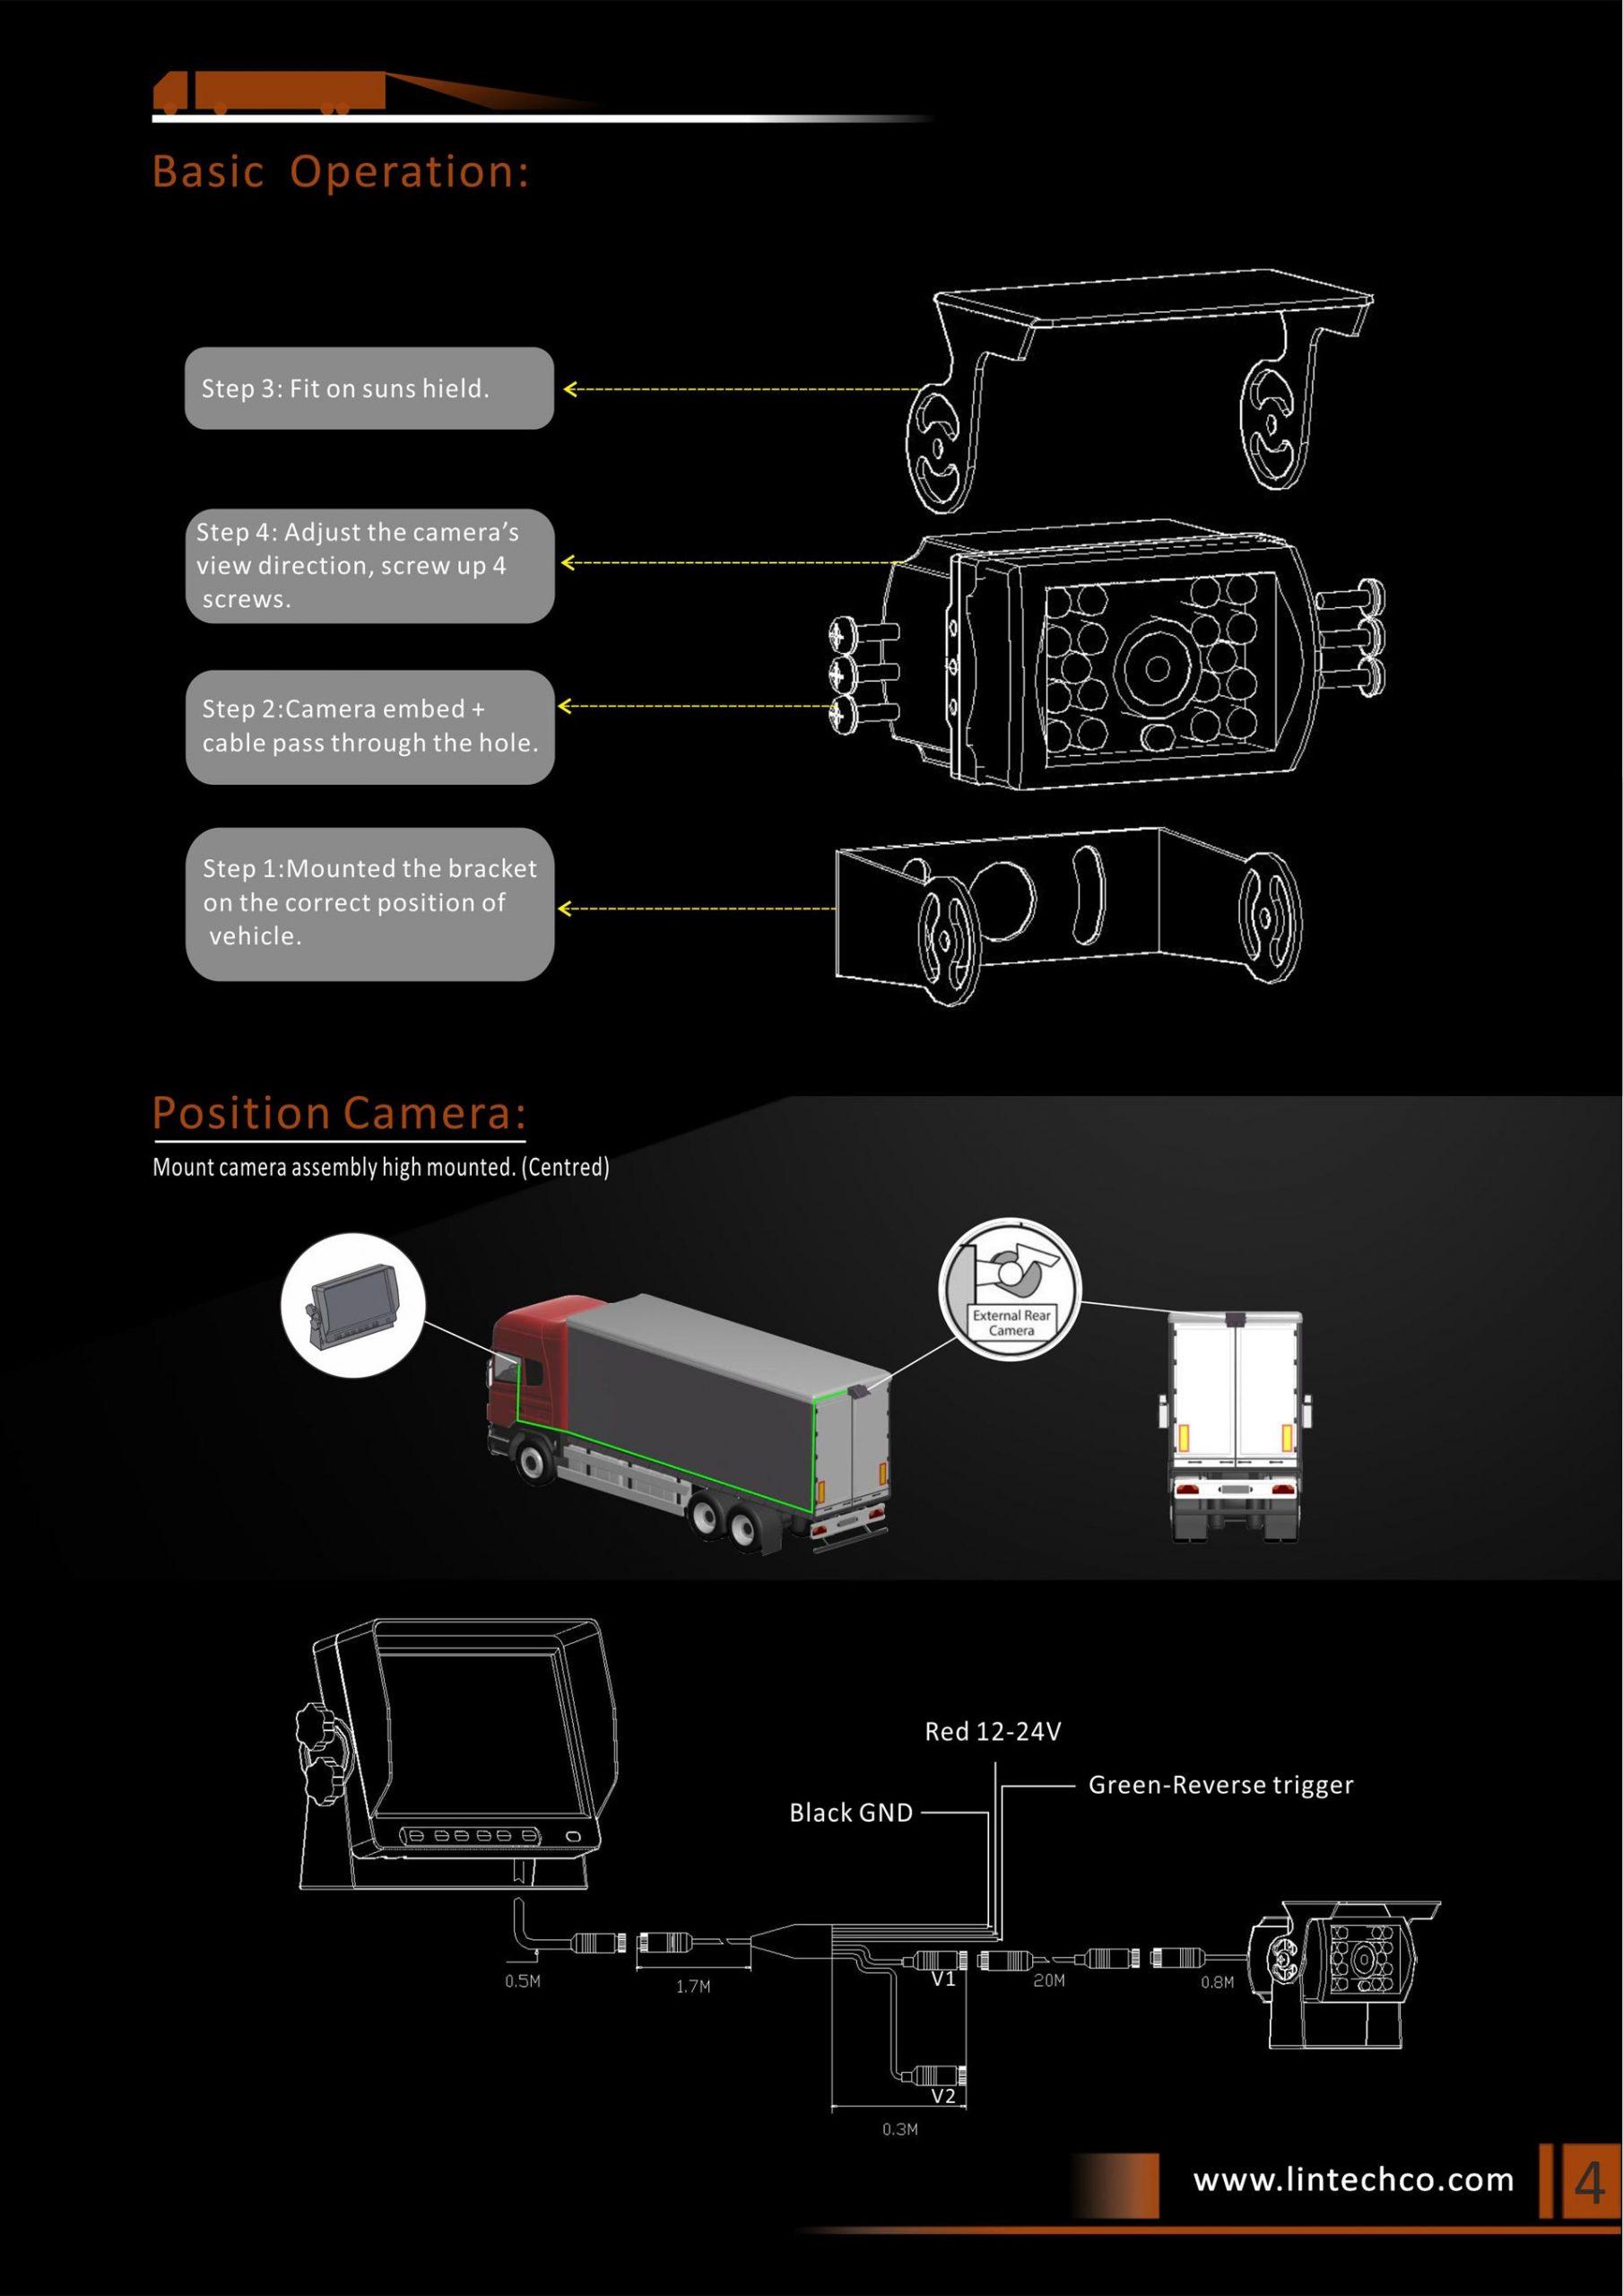 4.Classics Design Night Vision Waterproof Backup Camera